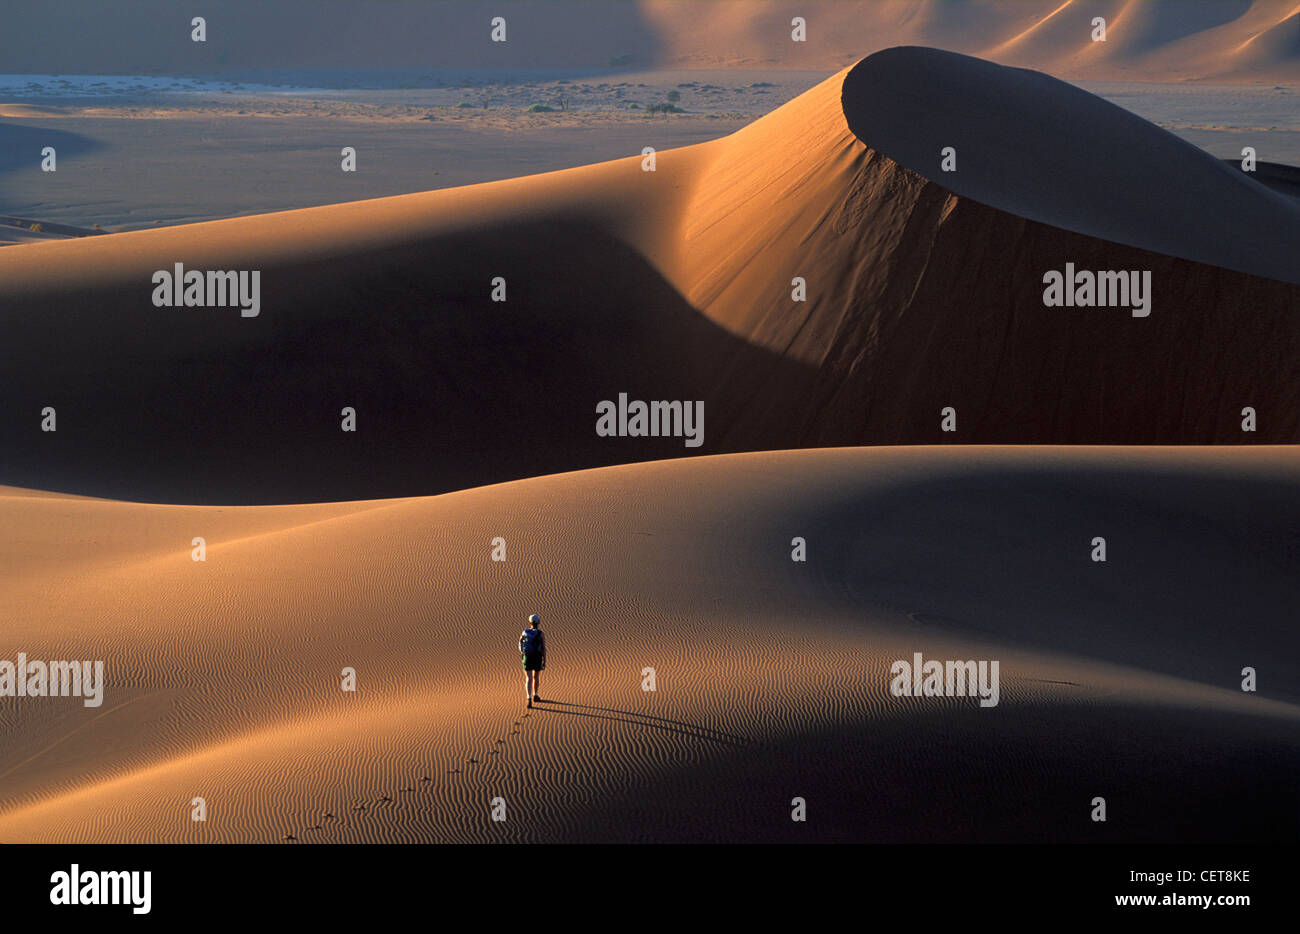 Battistrada arditamente sulle dune di sabbia, Namib Desert, Namibia, Africa Immagini Stock